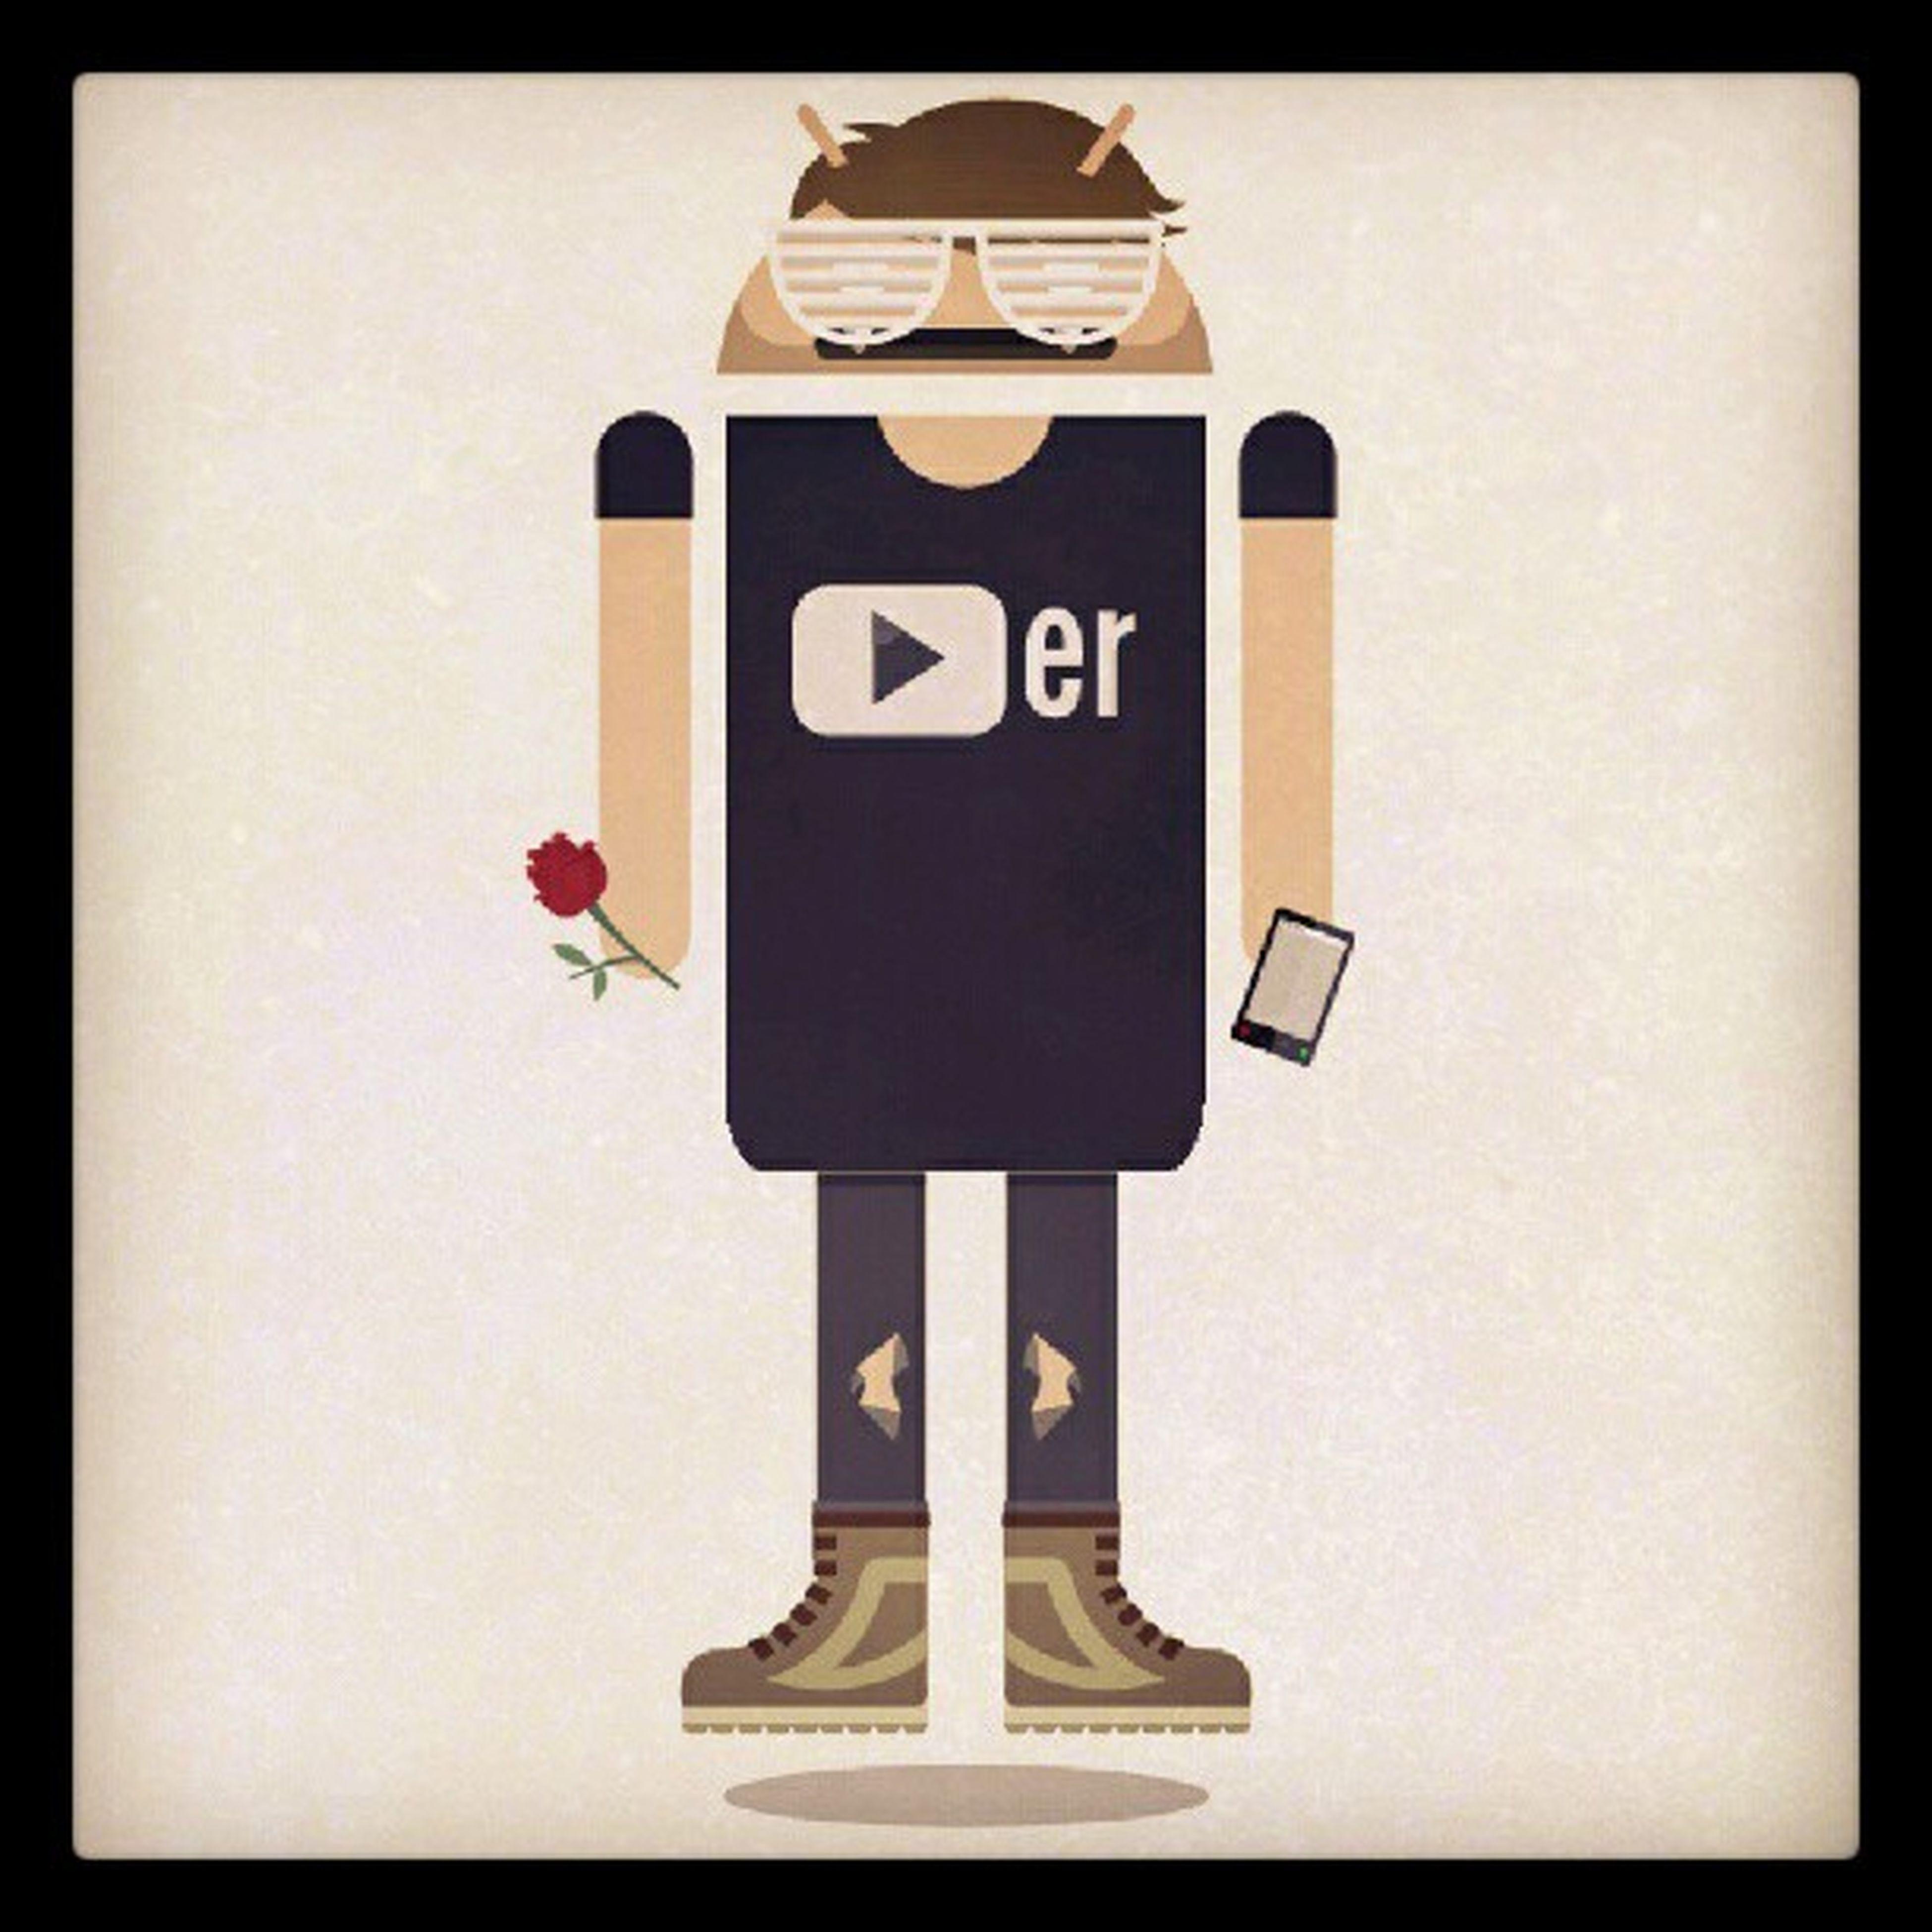 """I nak bagi u hadiah..u boleh pilih 1je..ros atau iphone?"" Sweetlahsangatkan Money Love Android androidify tiny toodle doodle rockoooo recycle mataduitan jiwang matrock matjiwang hahaha lovely life little crap cool nice boring eclipse rose iphone galaxy"